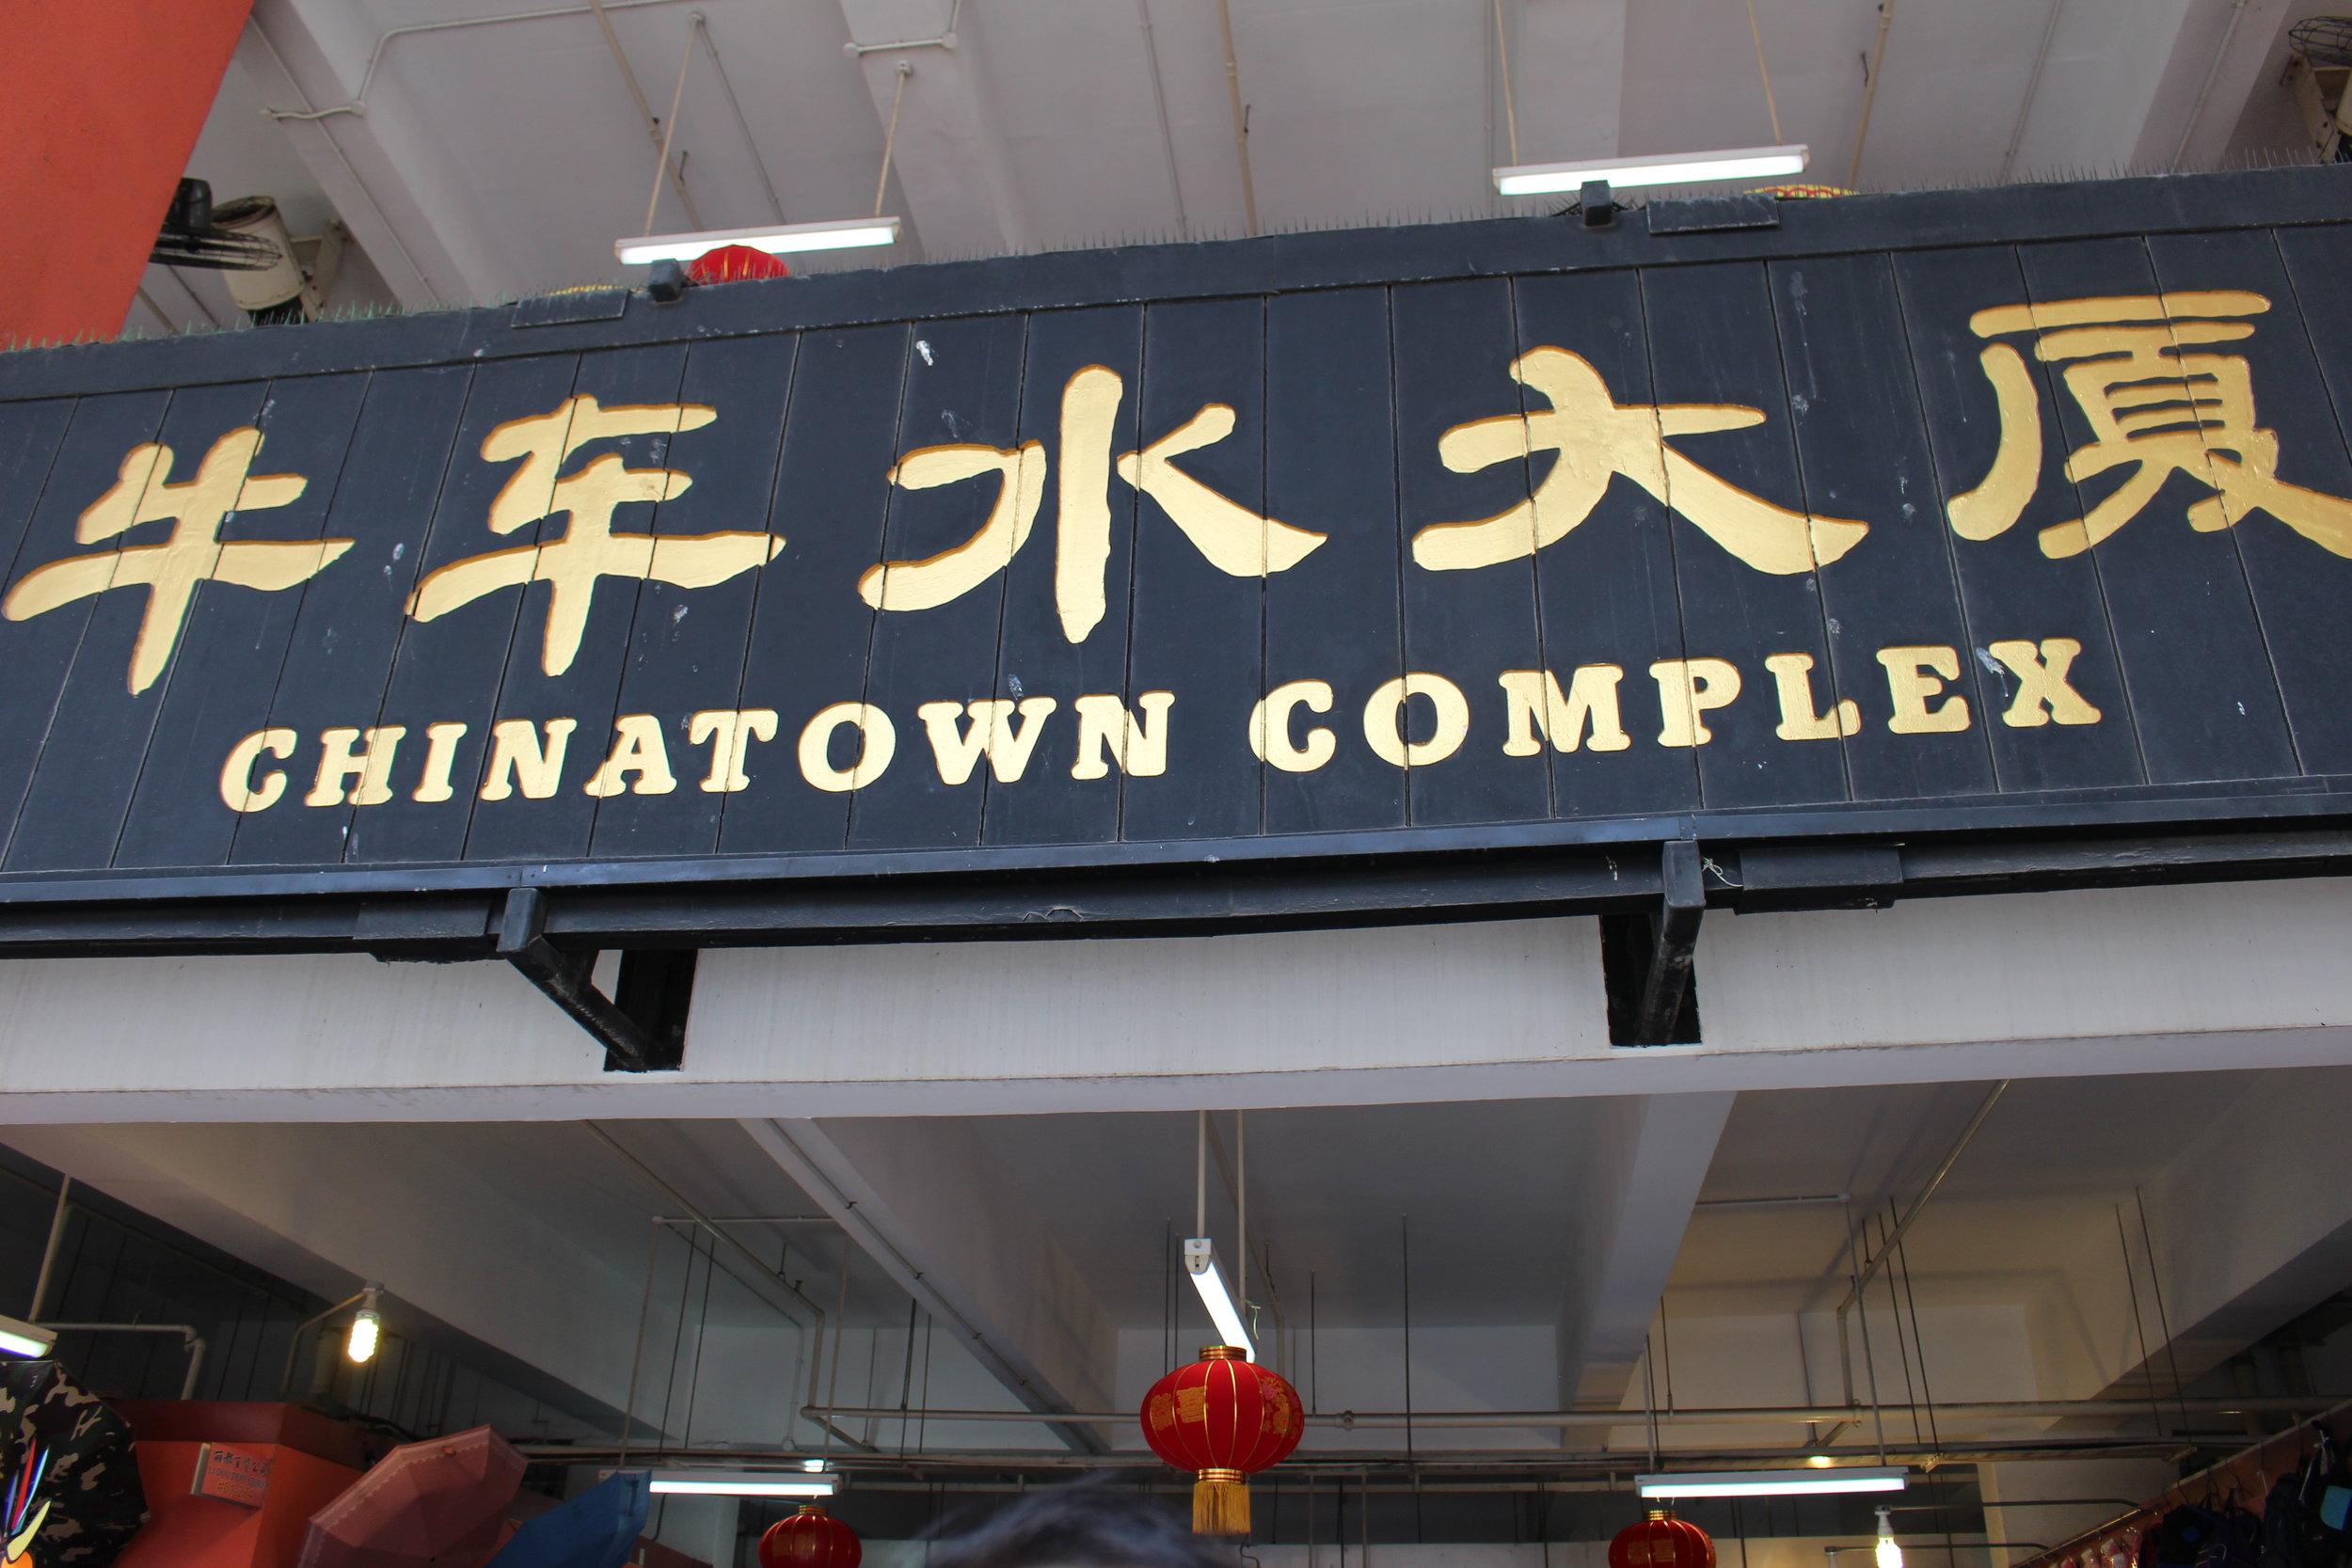 Chinatowncomplex